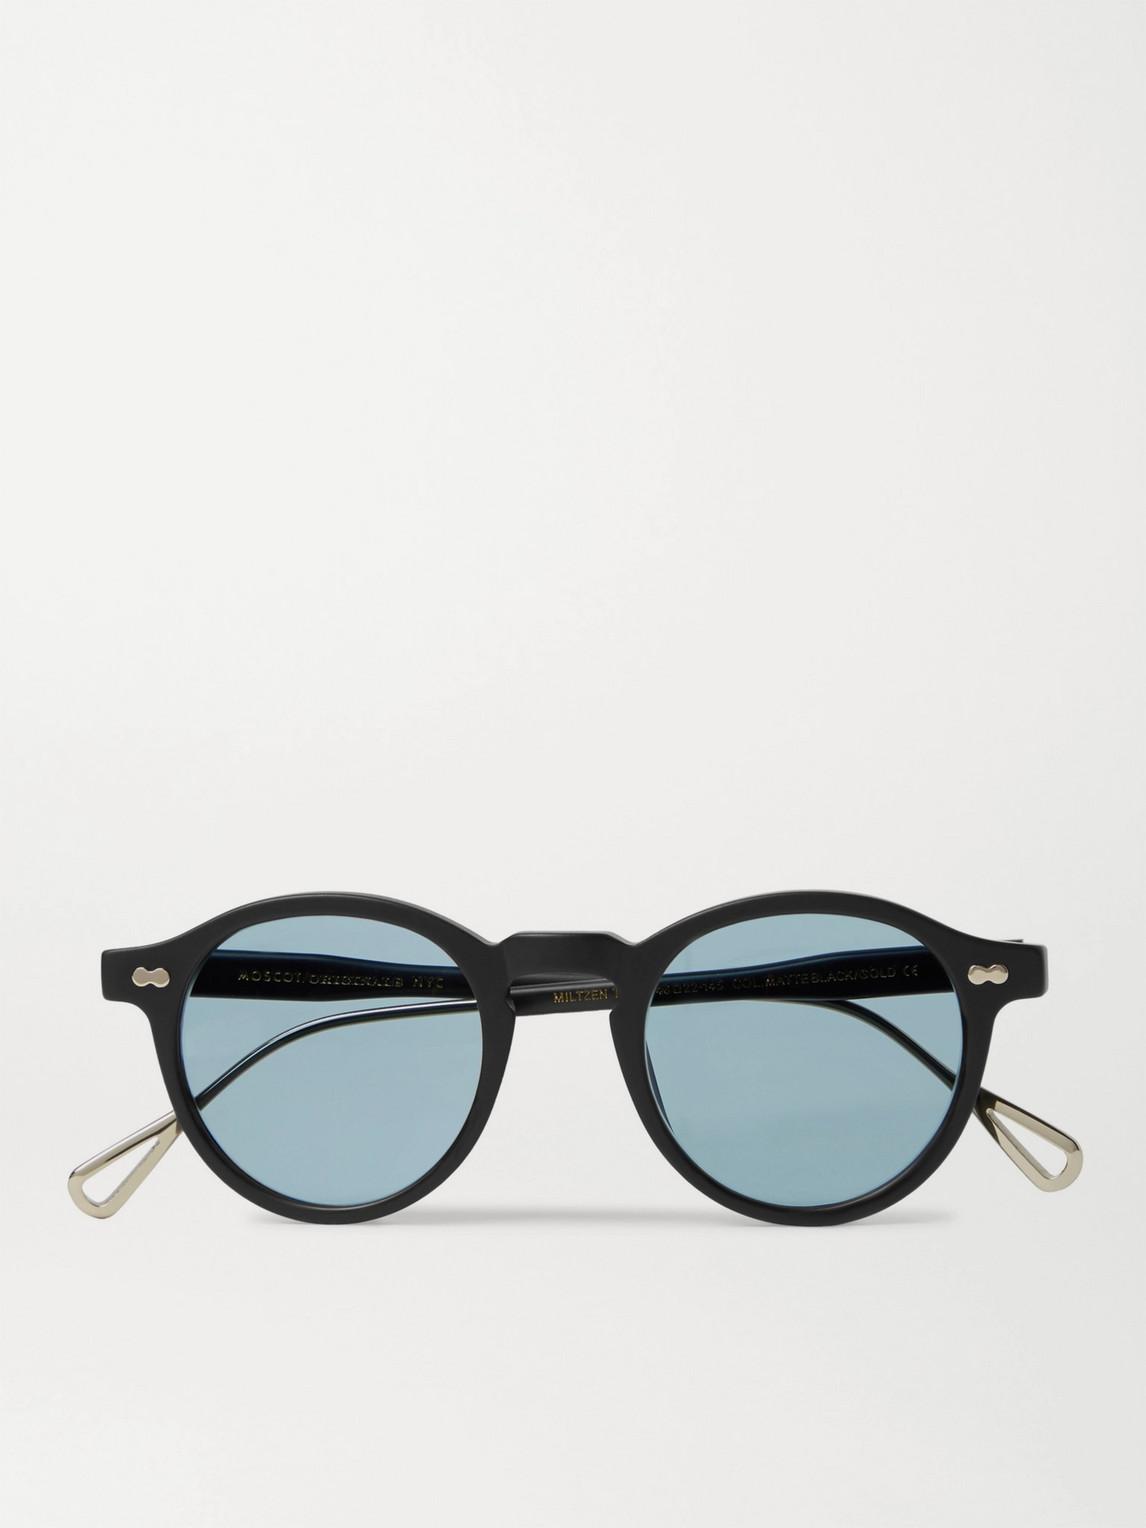 Moscot Miltzen-tt Round-frame Matte-acetate And Gold-tone Sunglasses In Black